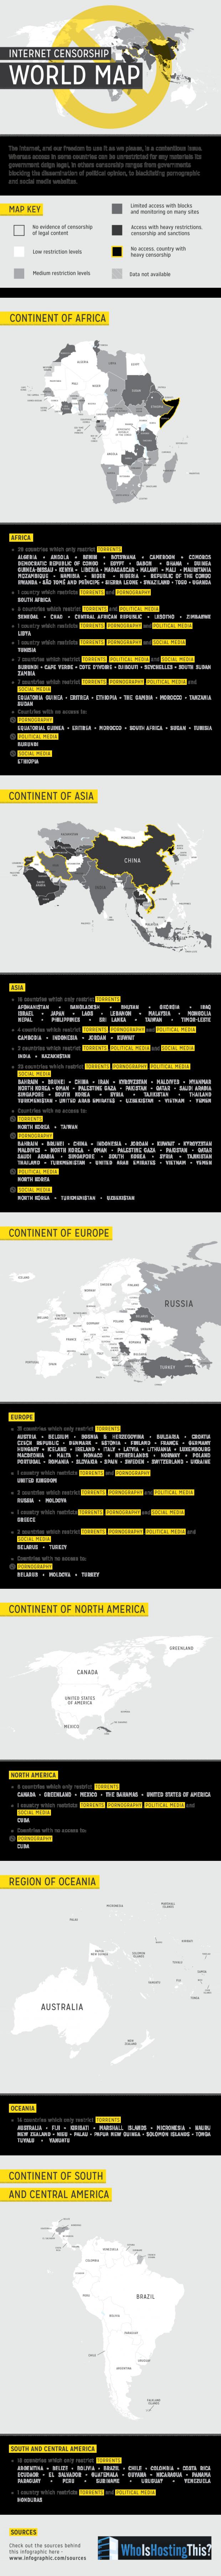 internet-censorship-world-map